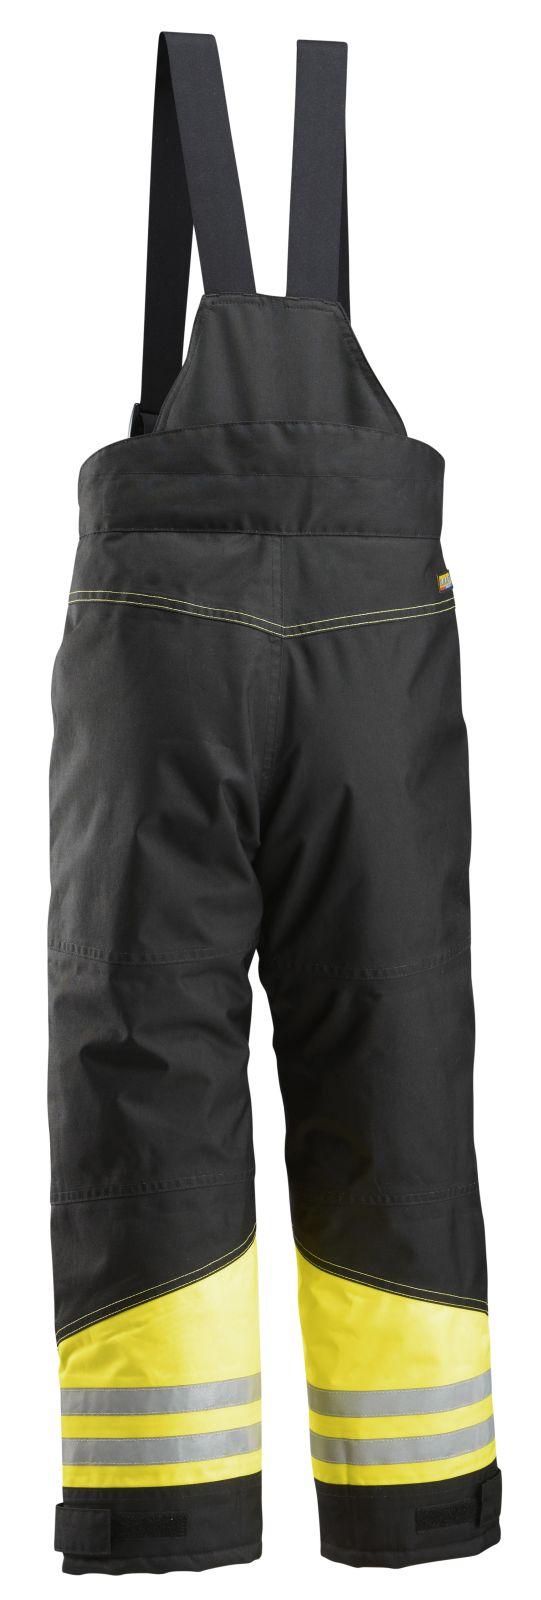 Blaklader Kinderkleding 18581977 zwart-geel(9933)